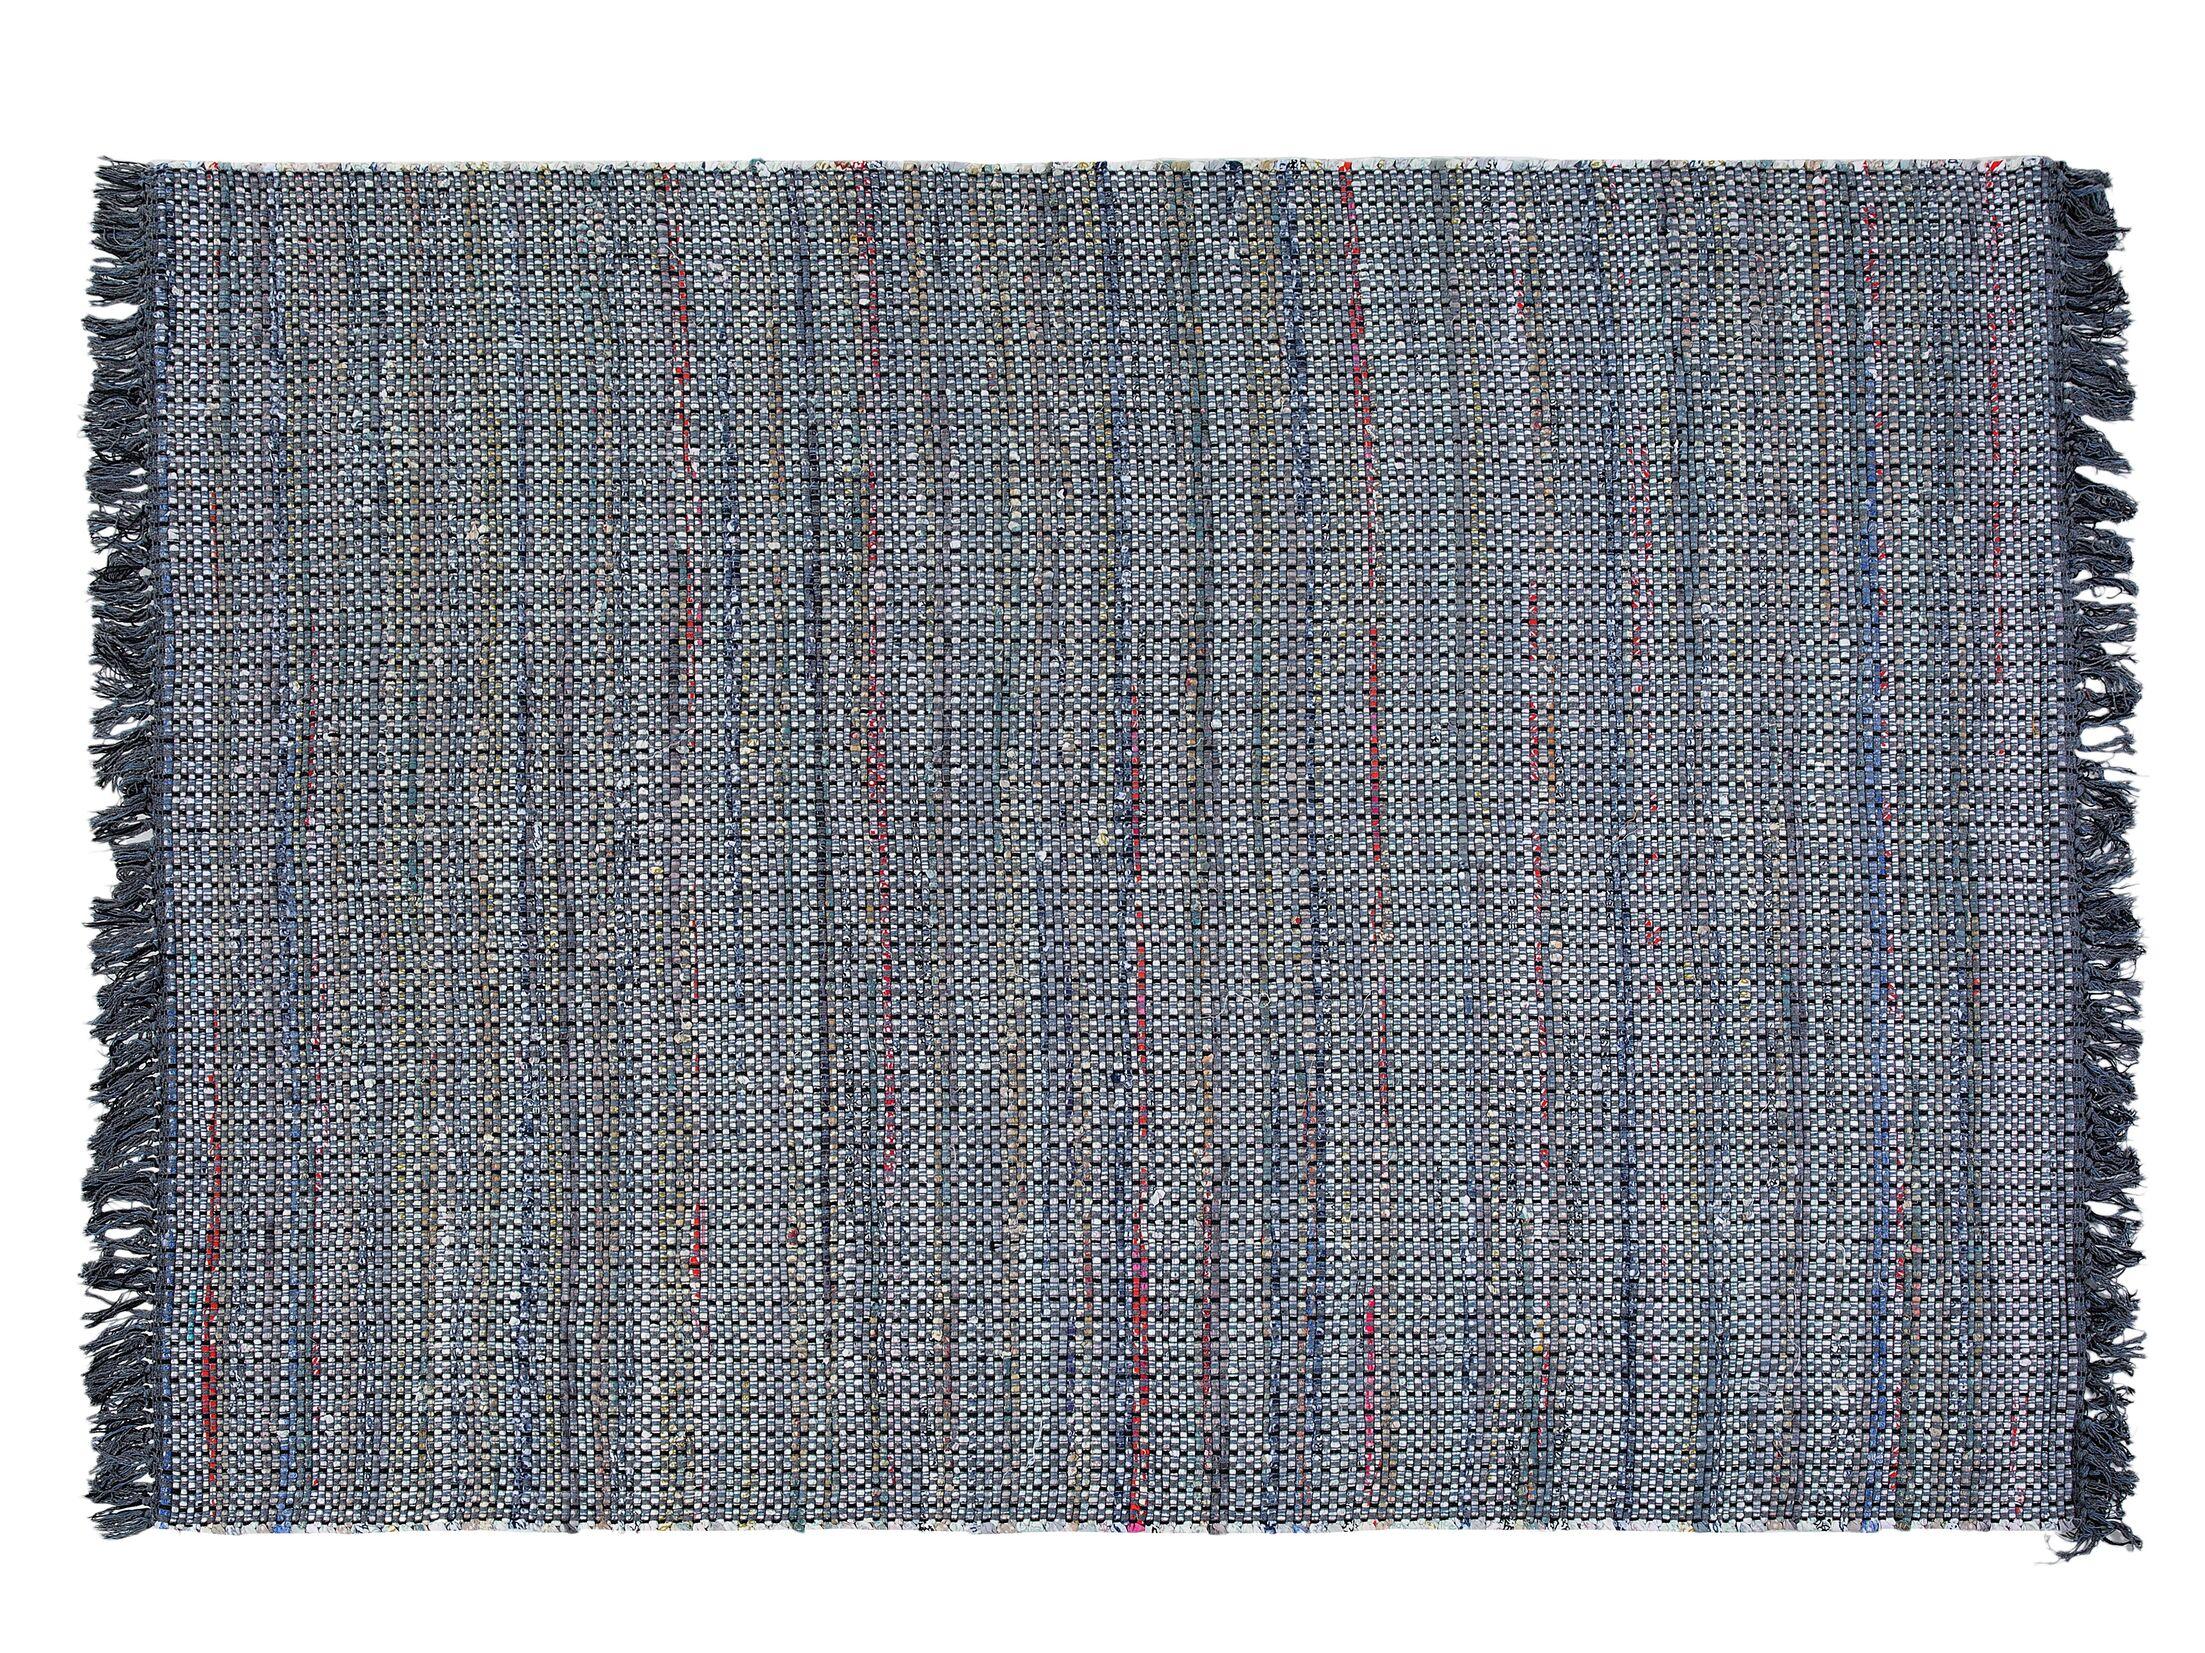 Besni Handwoven Gray Area Rug Size: 5'2